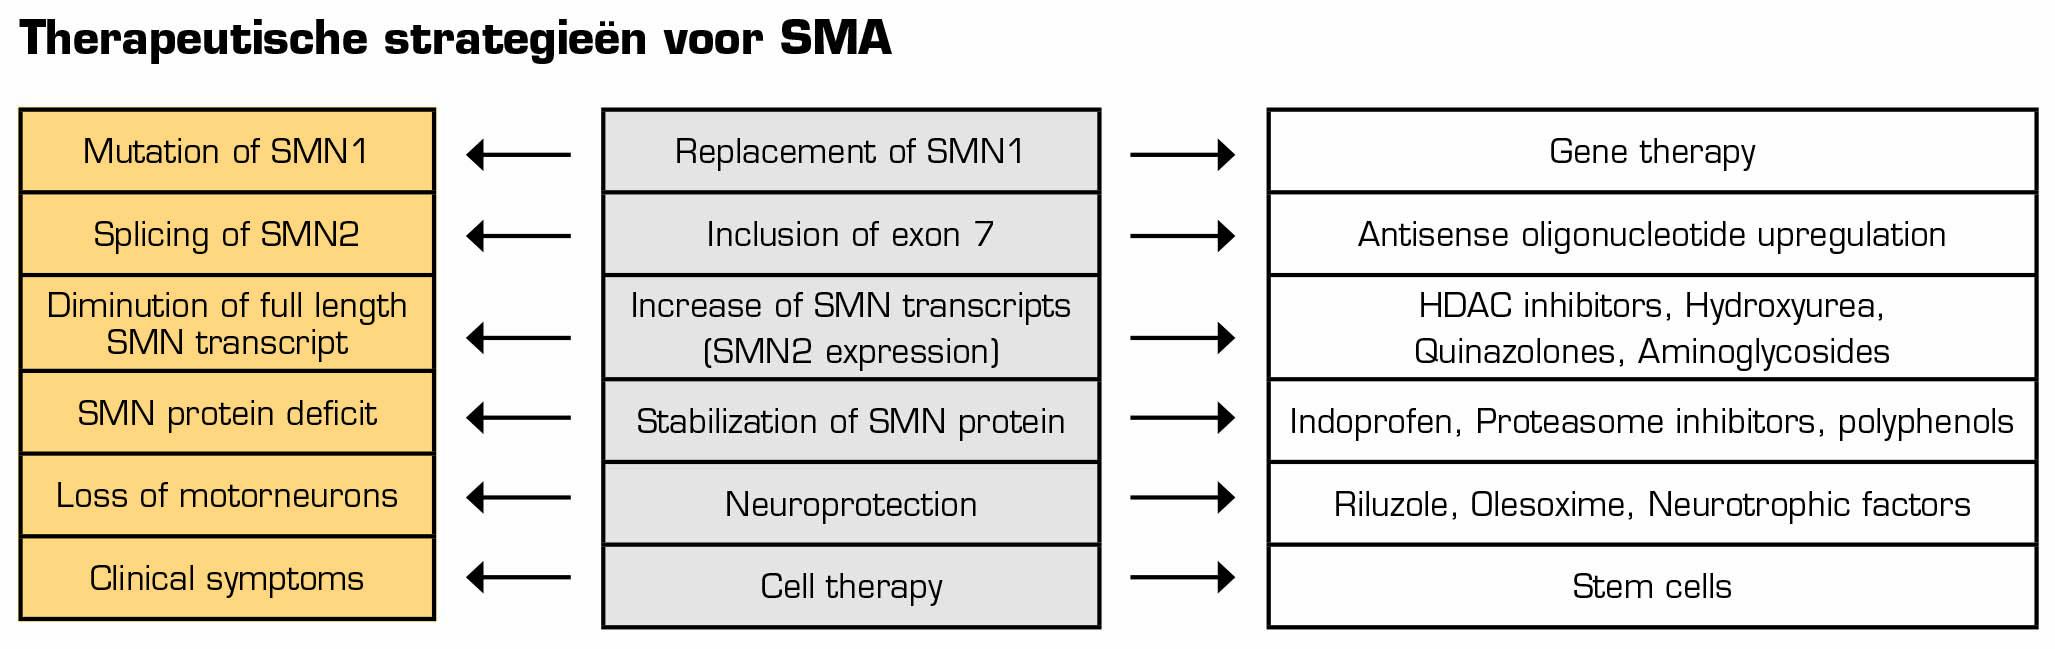 SPINAL-NEURON Spinale musculaire atrofie (SMA) - Presentaties gastsprekers themadag 24 oktober 2015